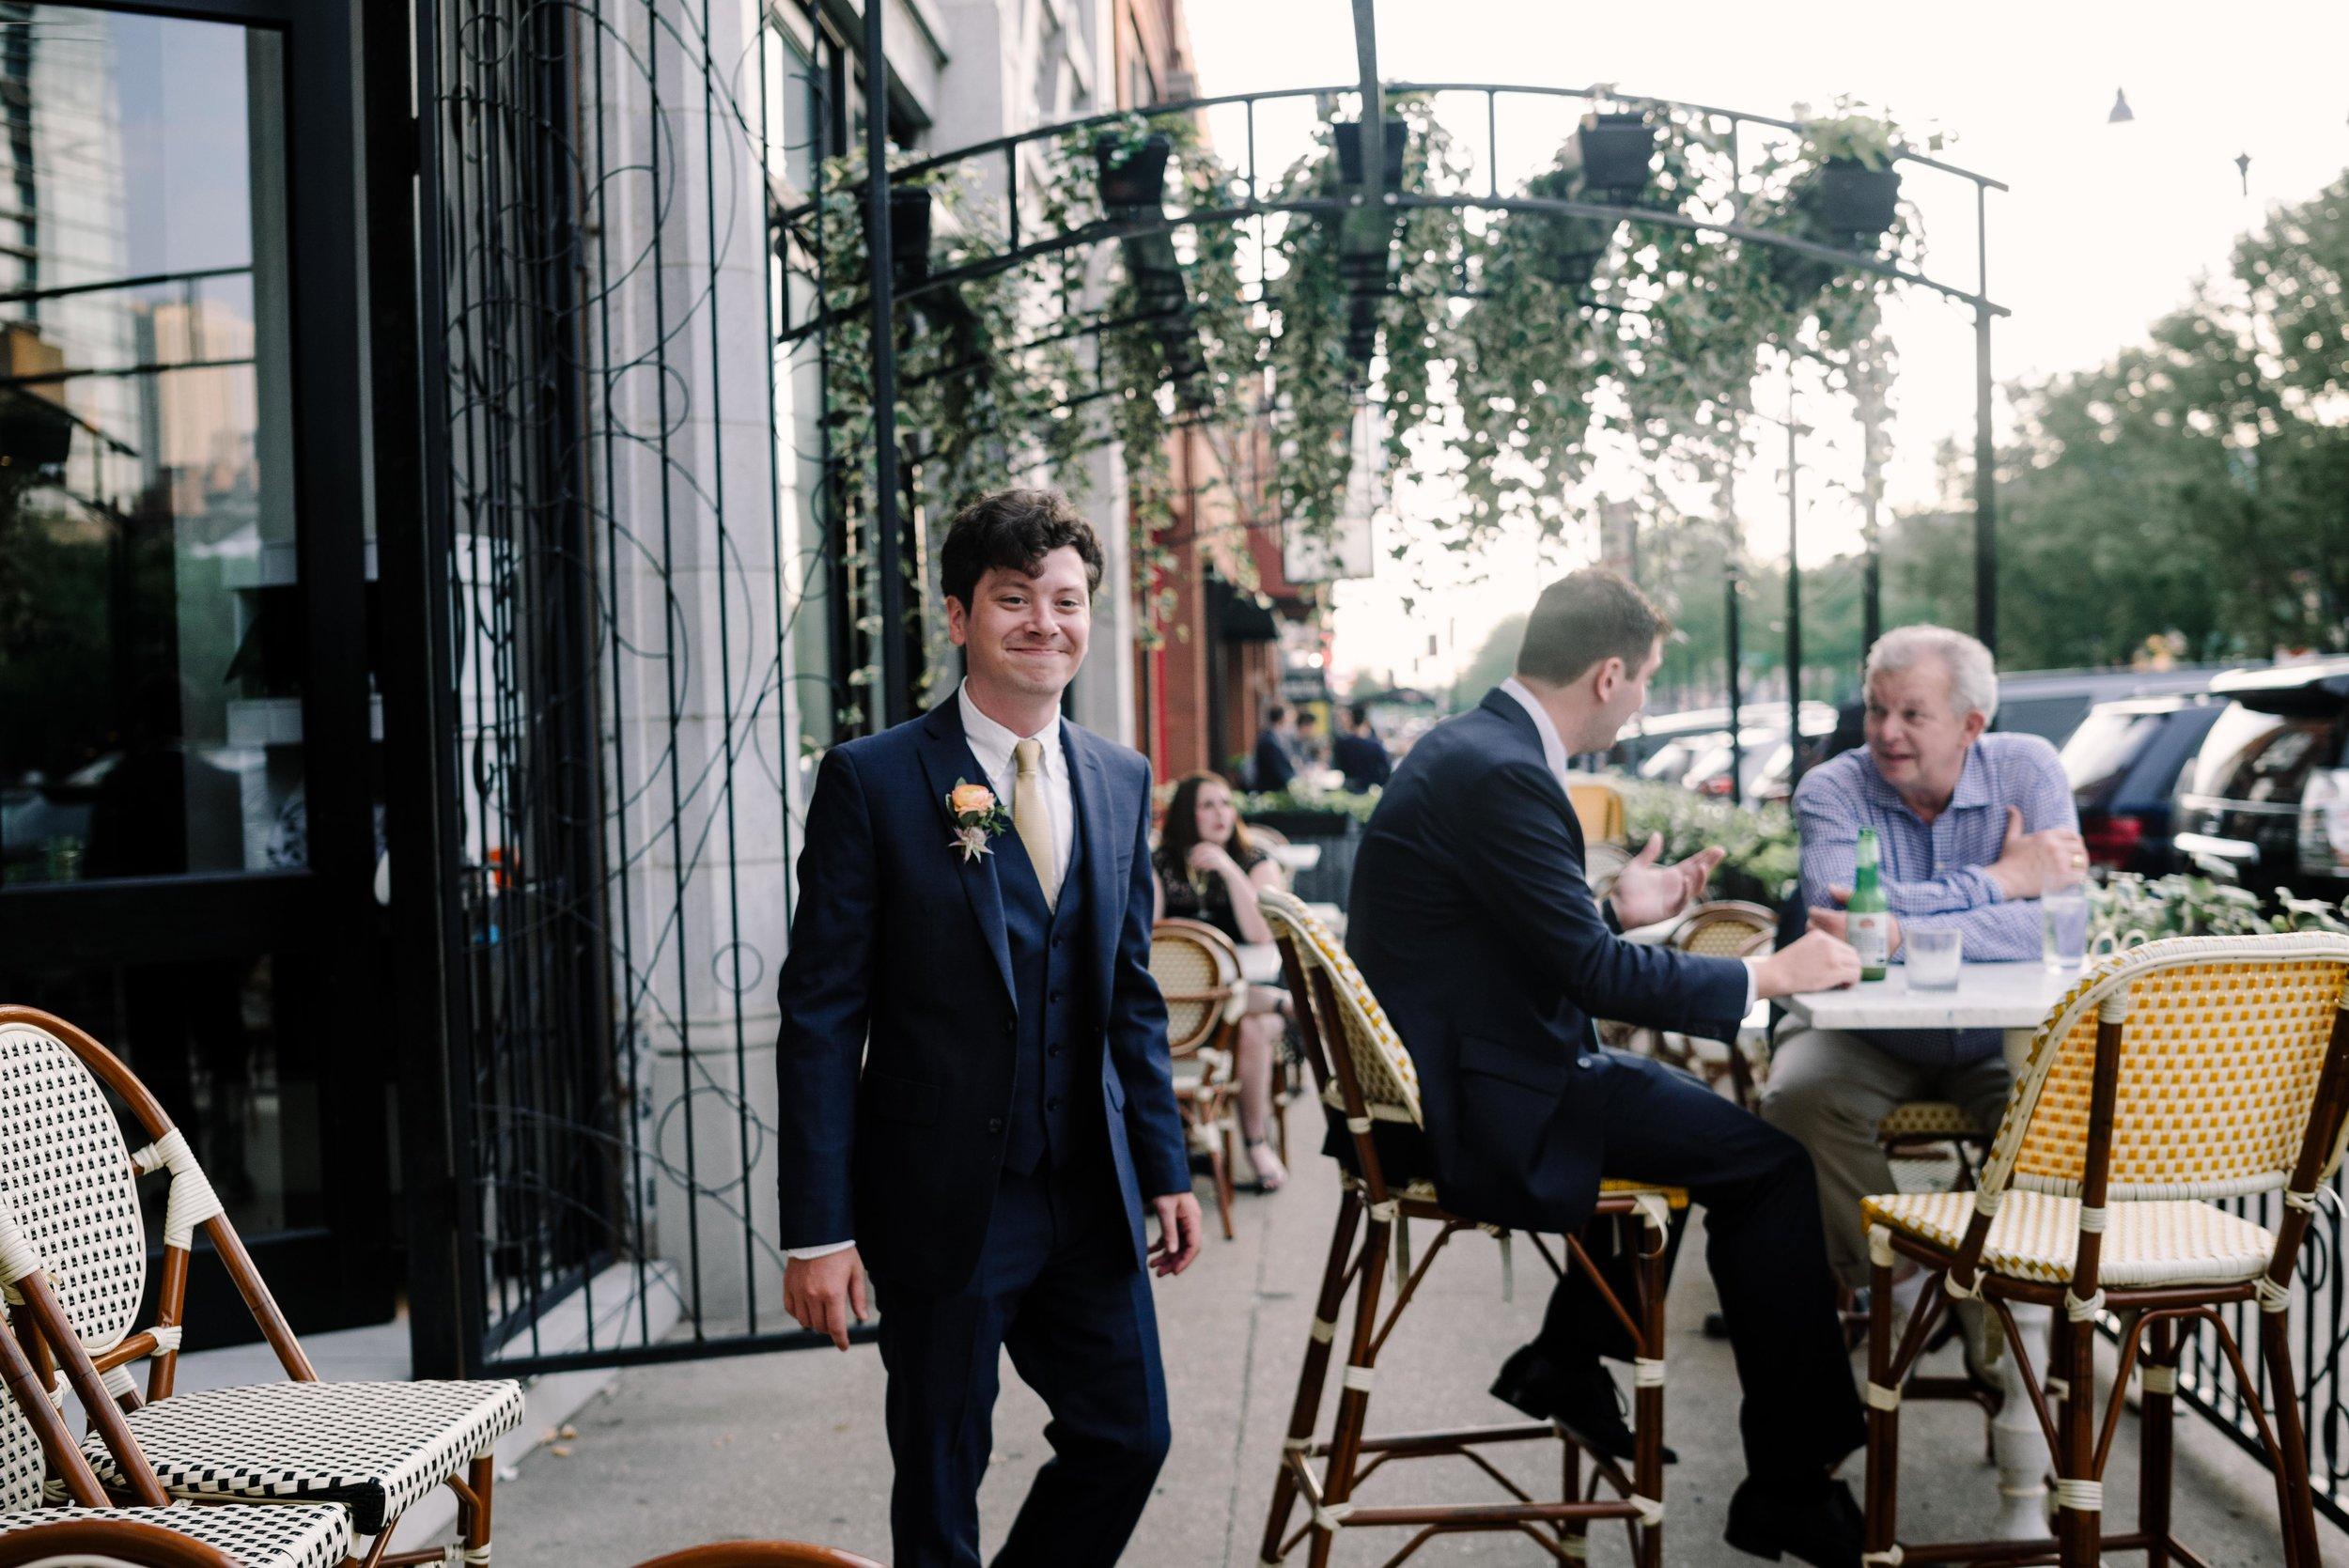 Patricia-Steve-Blog-Indianapolis-Wedding-102.jpg